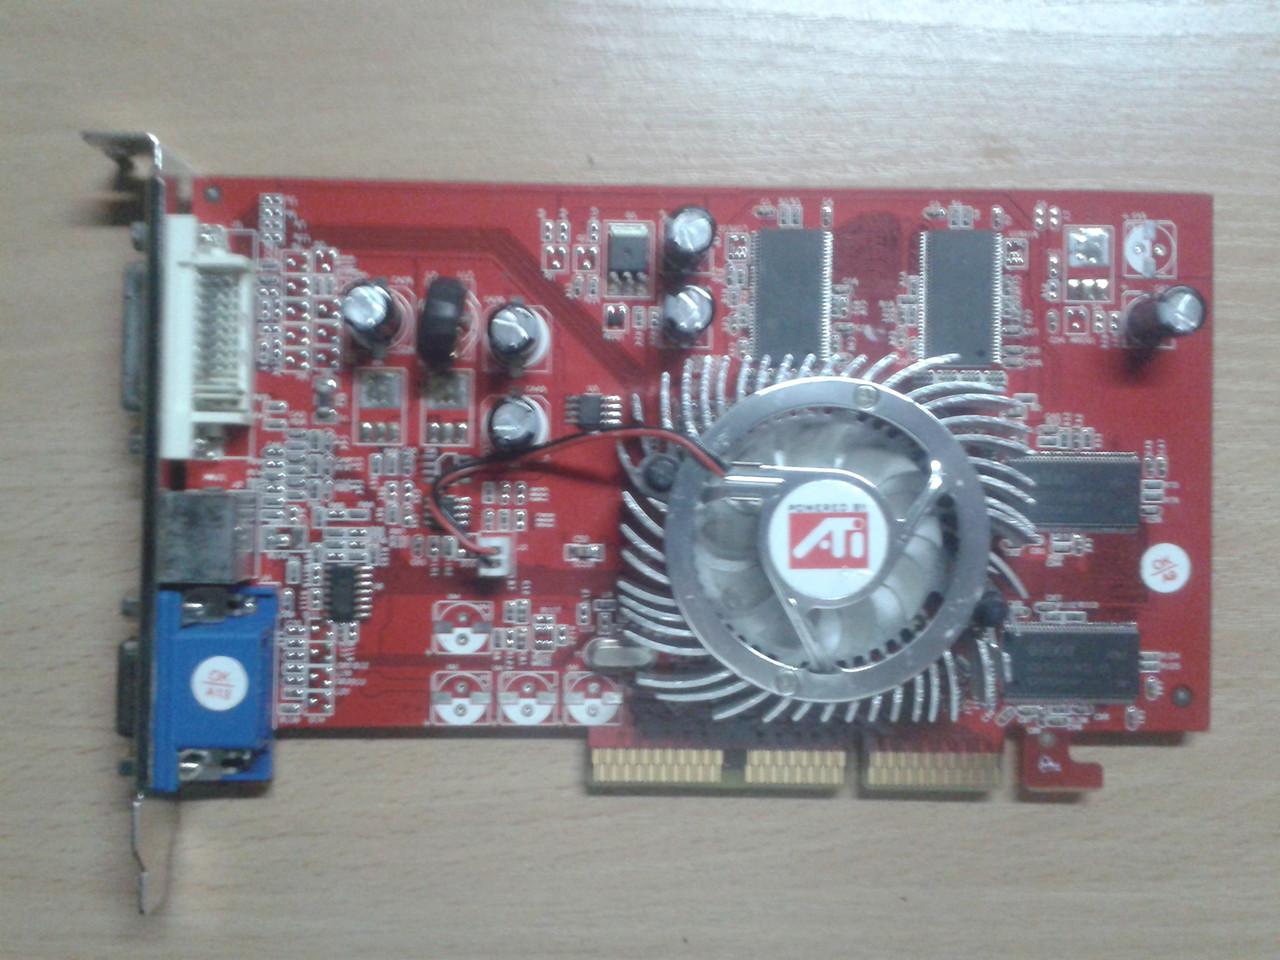 ATI Radeon 9550 / 256MB DDR / AGP 8x / DVI / VGA / TV Out / Video Card